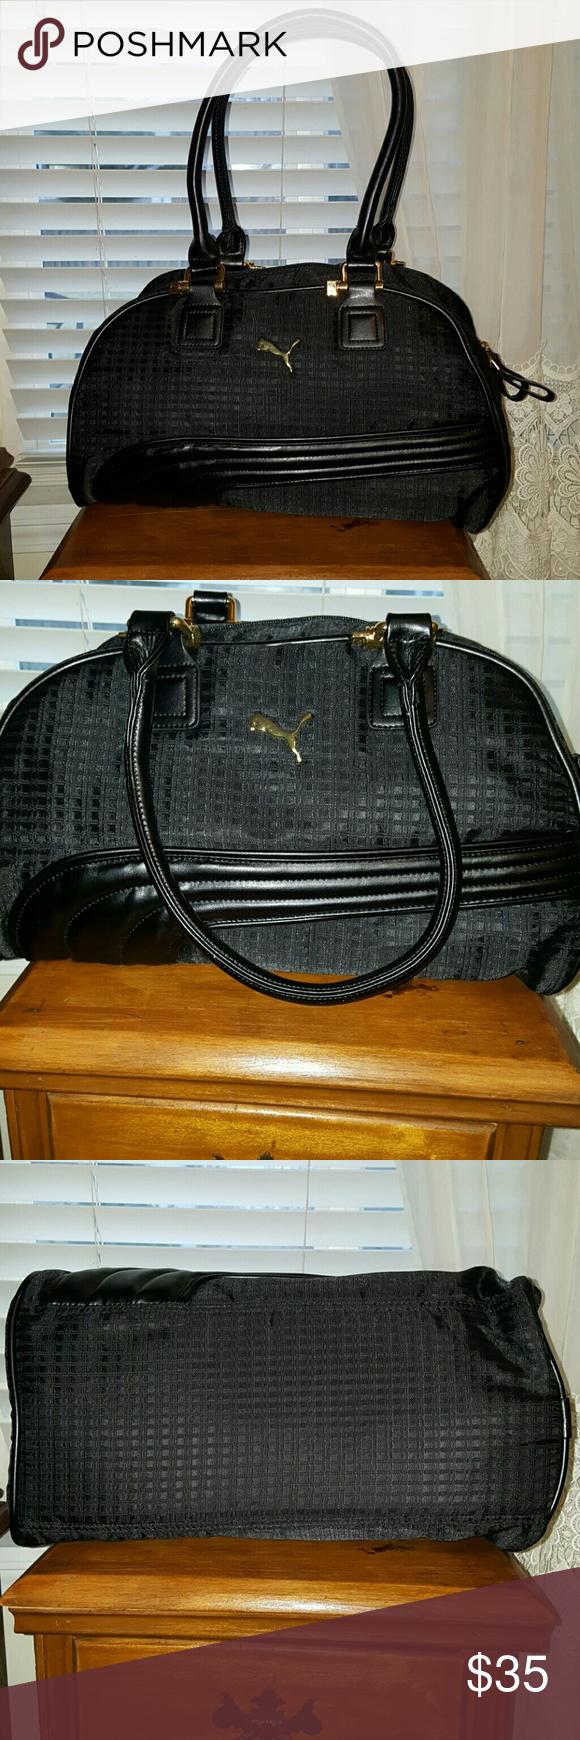 PUMA CARTEL HANDBAG Can be used as a everyday shoulderbag 50abc9f50a388